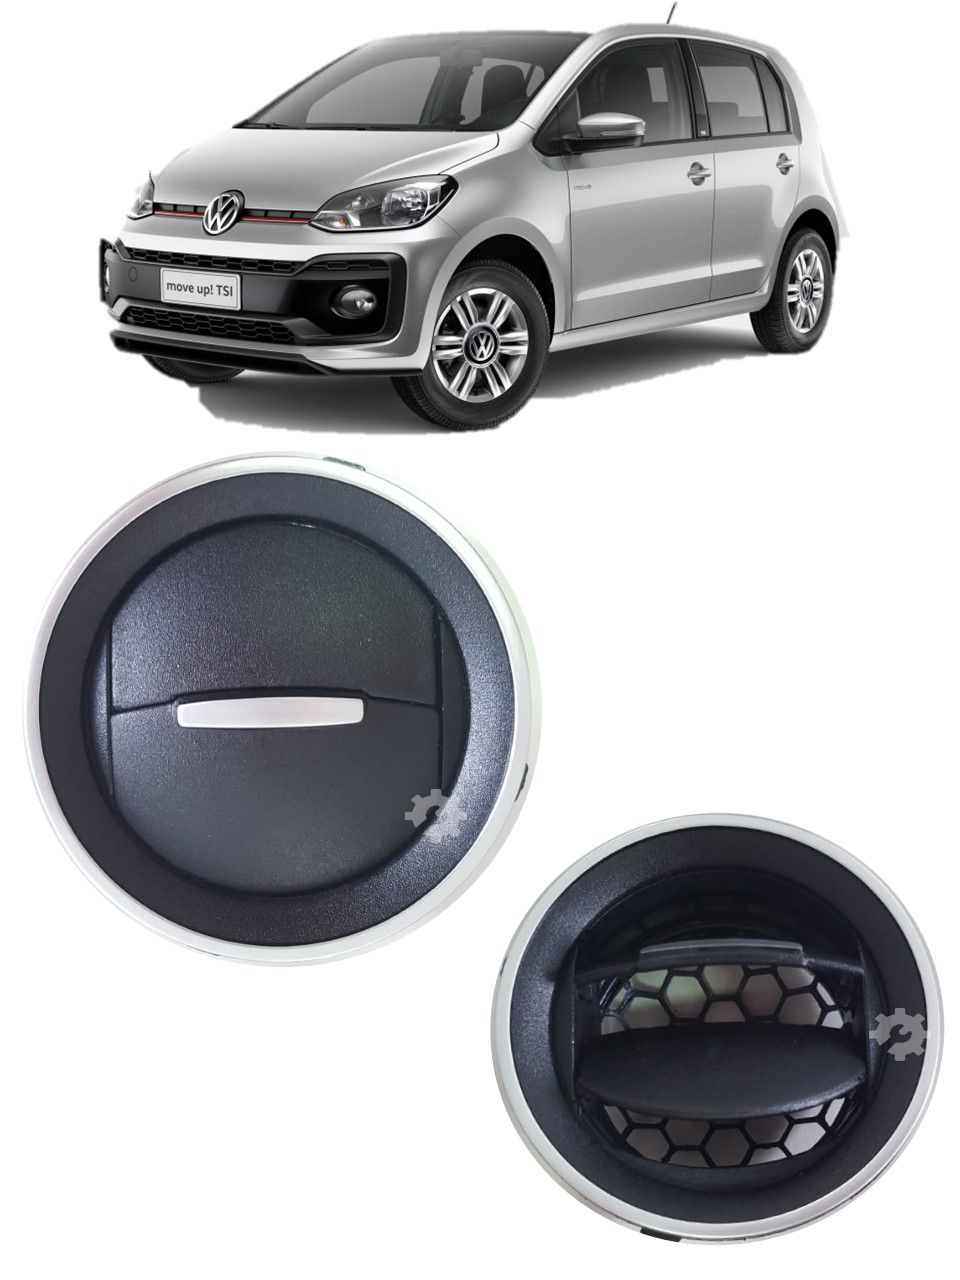 Difusor Ar Branco Volkswagen Up 2014 2015 2017 2019